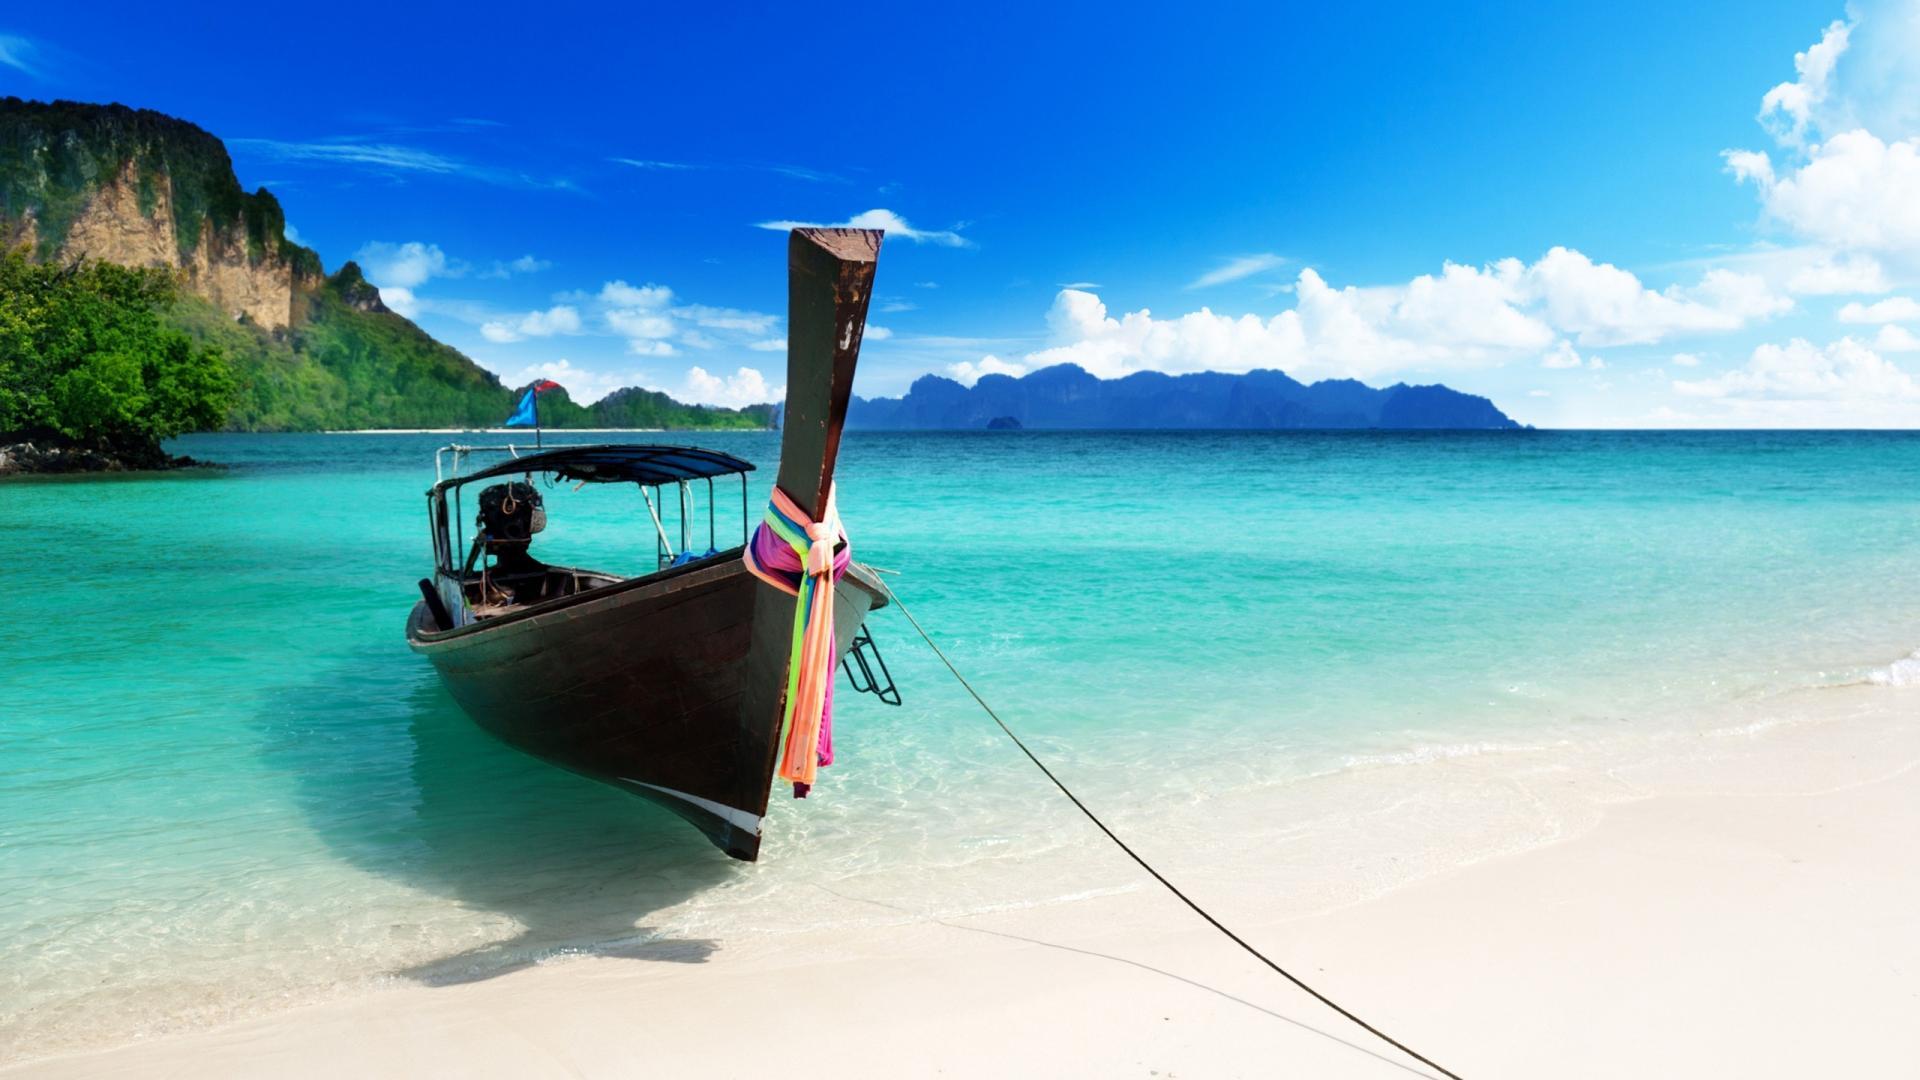 Background image 1080p - Beach Background Wallpaper 1080p